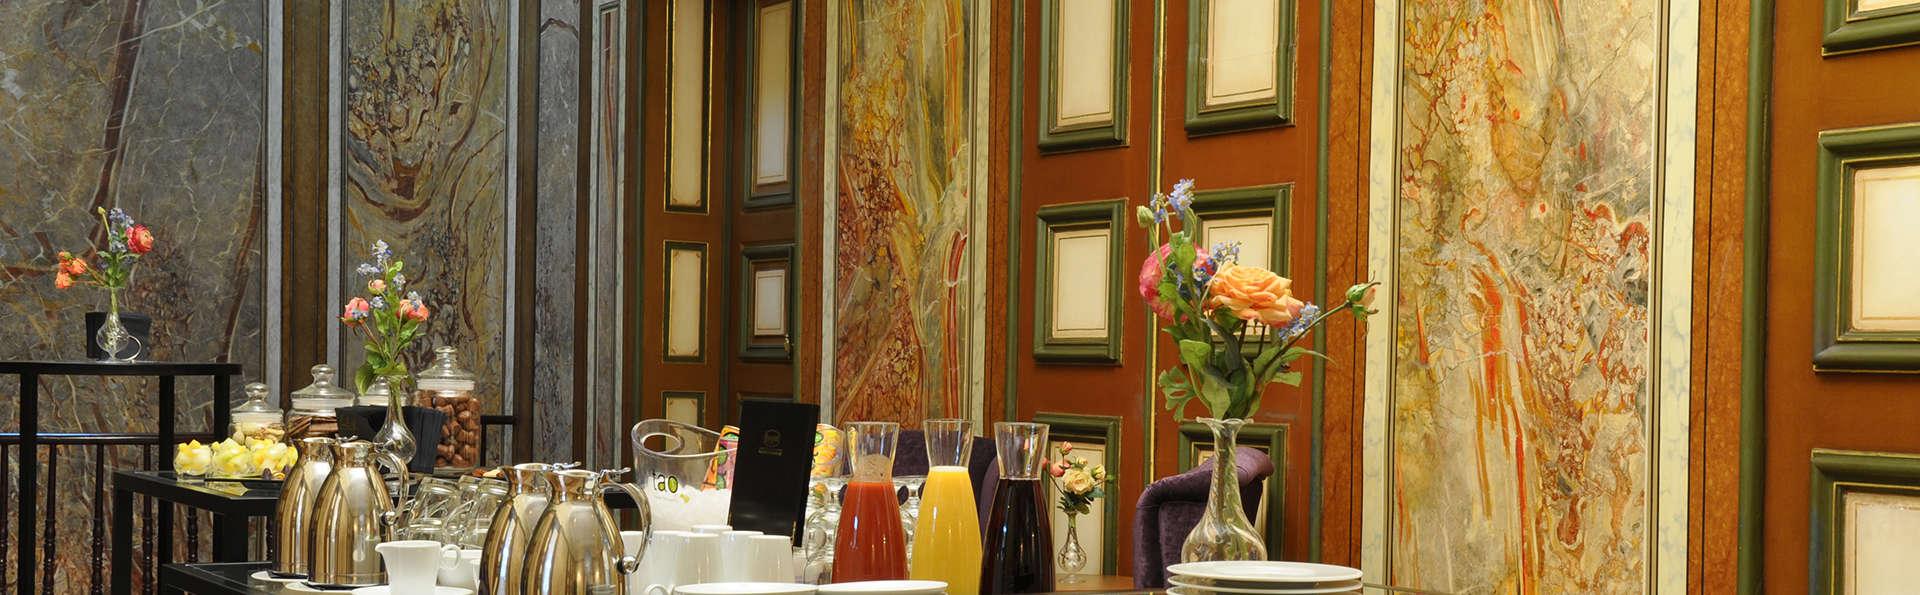 Sandton Grand Hotel Reylof Gent - EDIT_breakfast.jpg